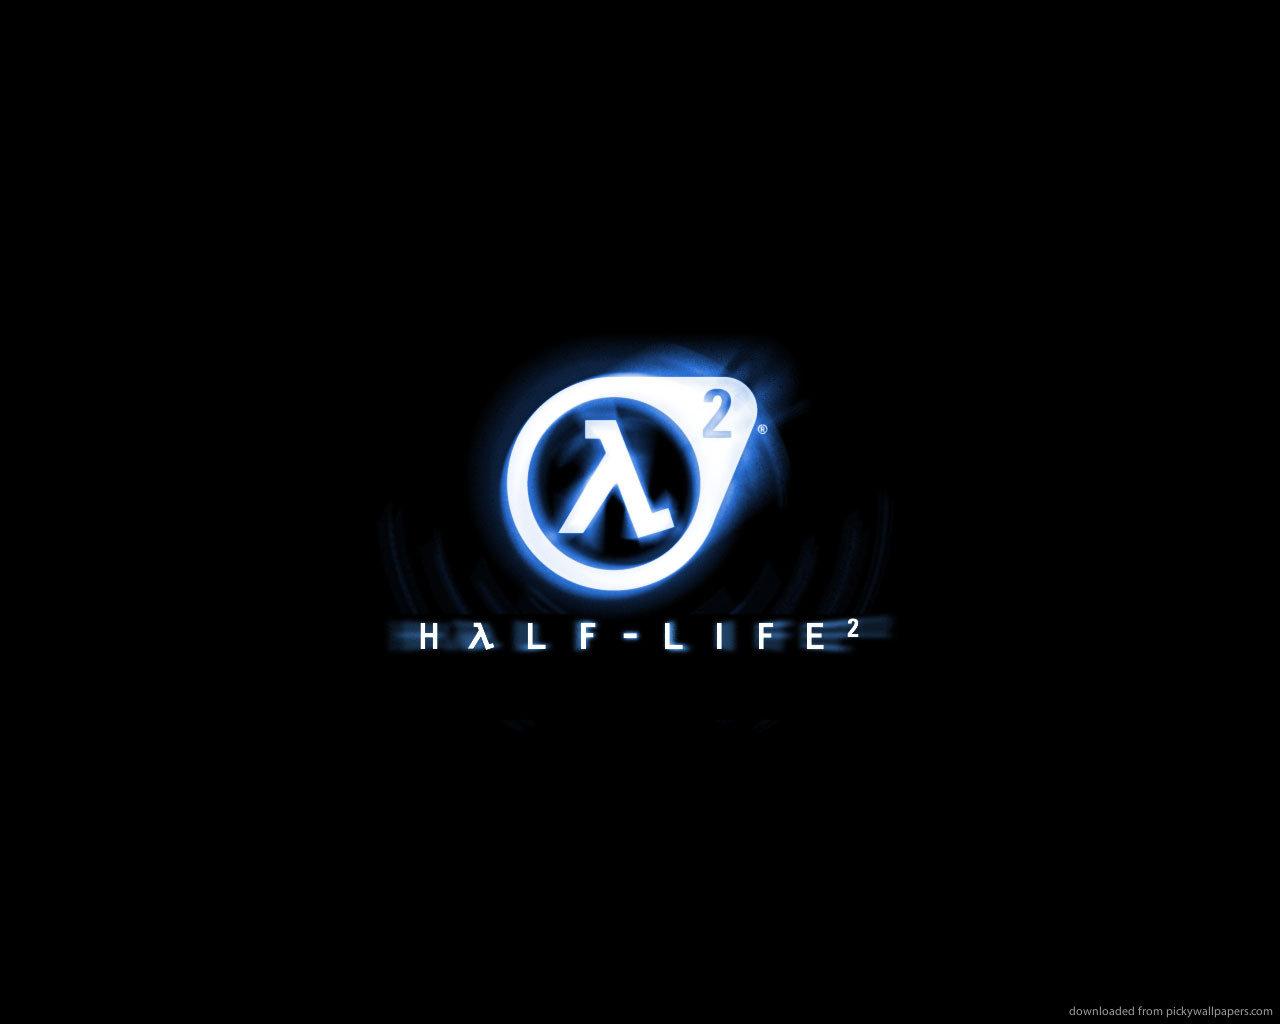 Half Life 2 Wallpapers Hd For Desktop Backgrounds